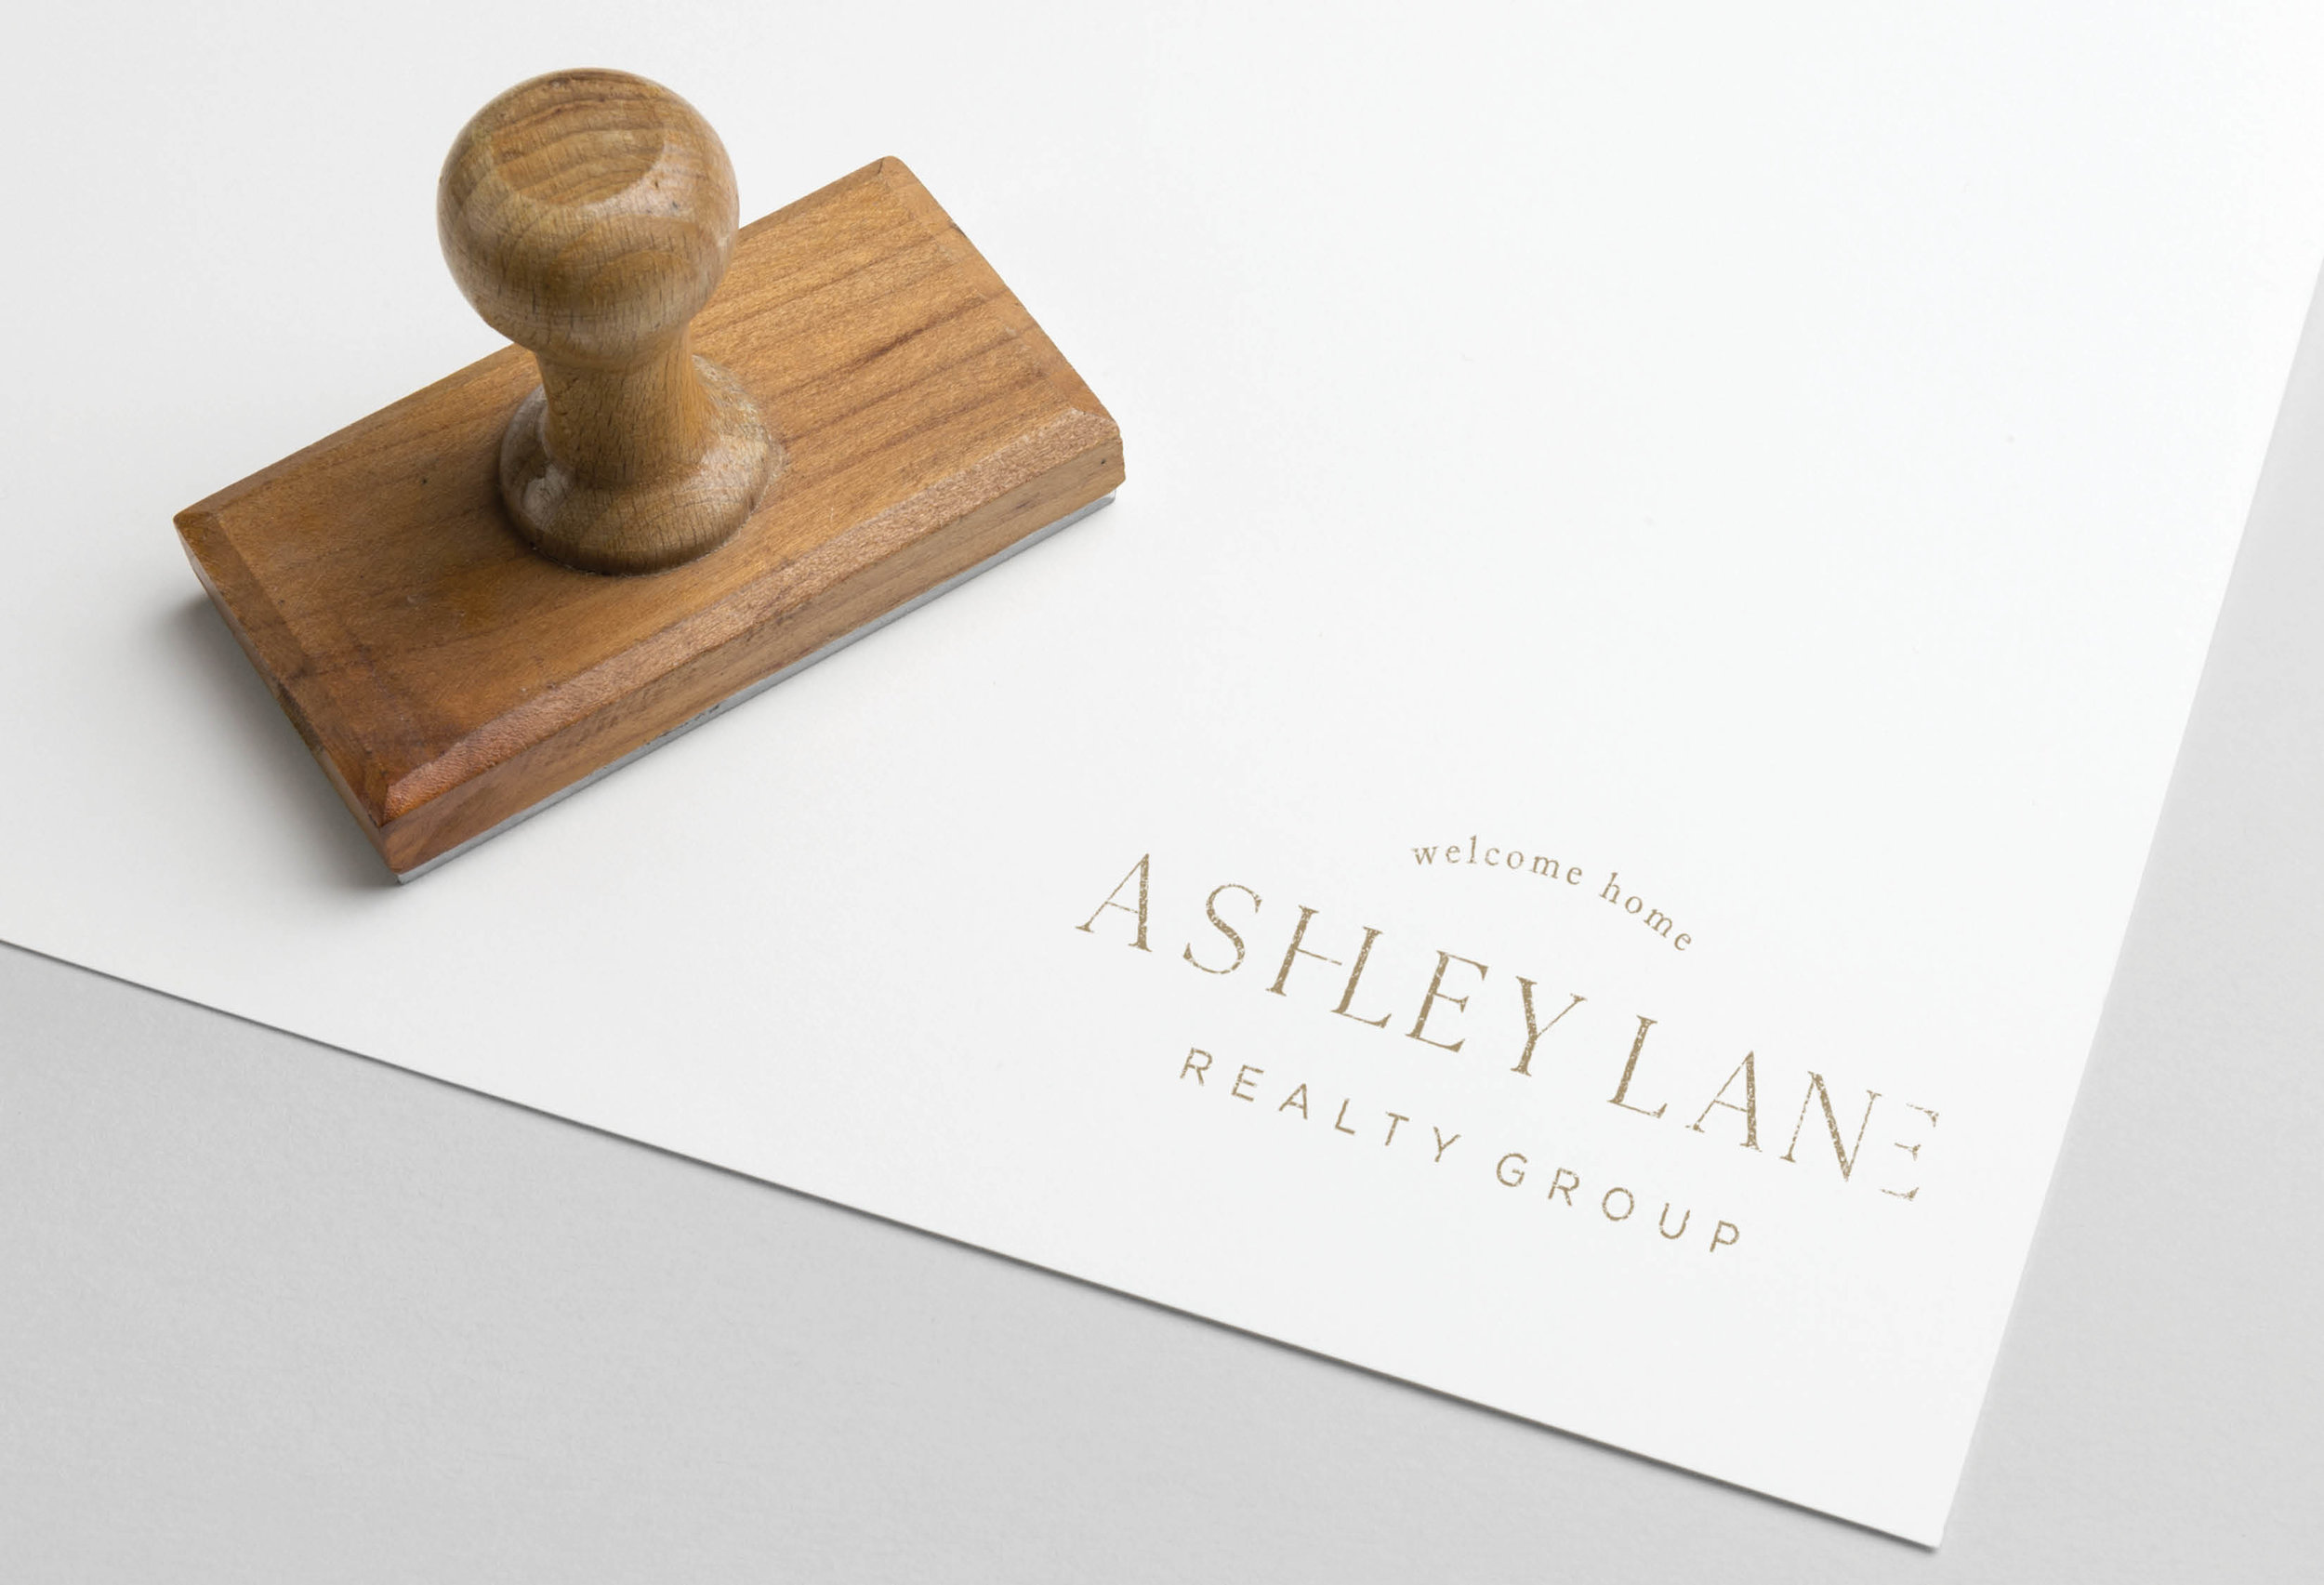 Ashley Lane Realty4.jpg